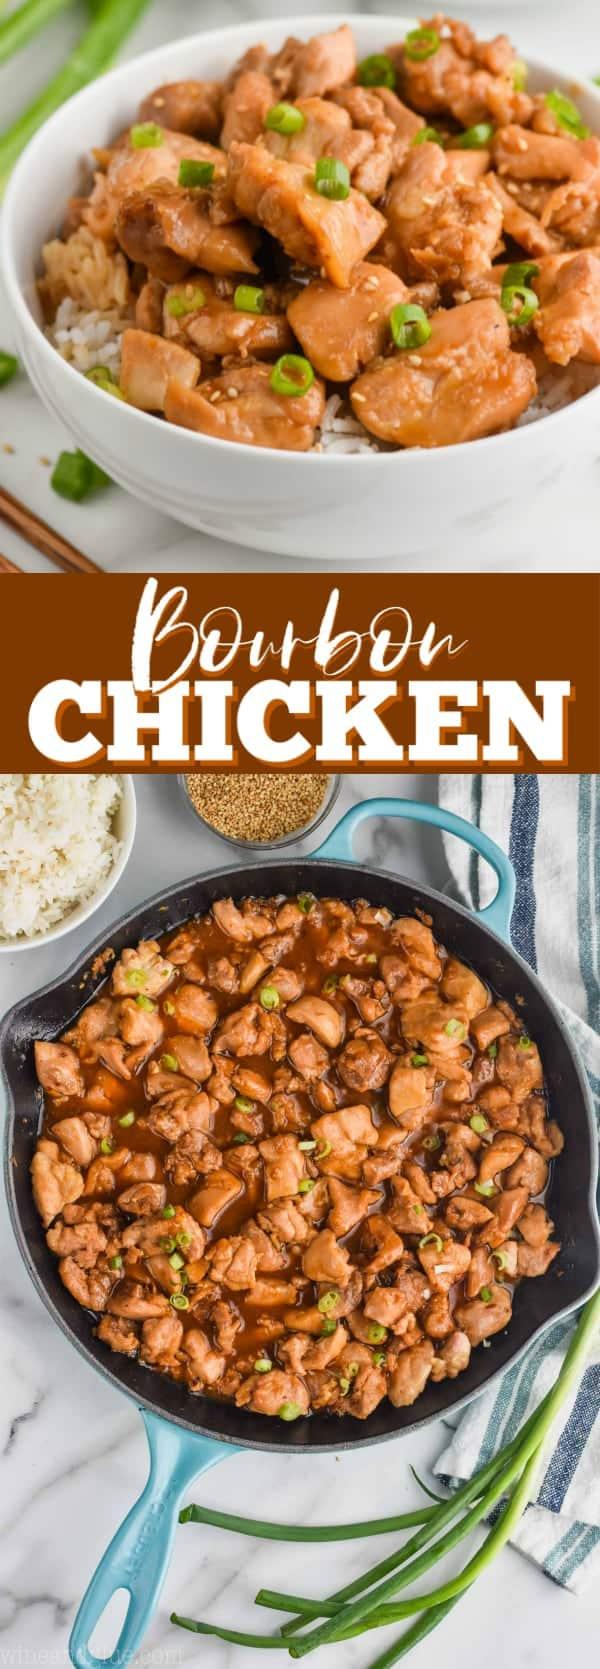 up close view of bourbon chicken recipe